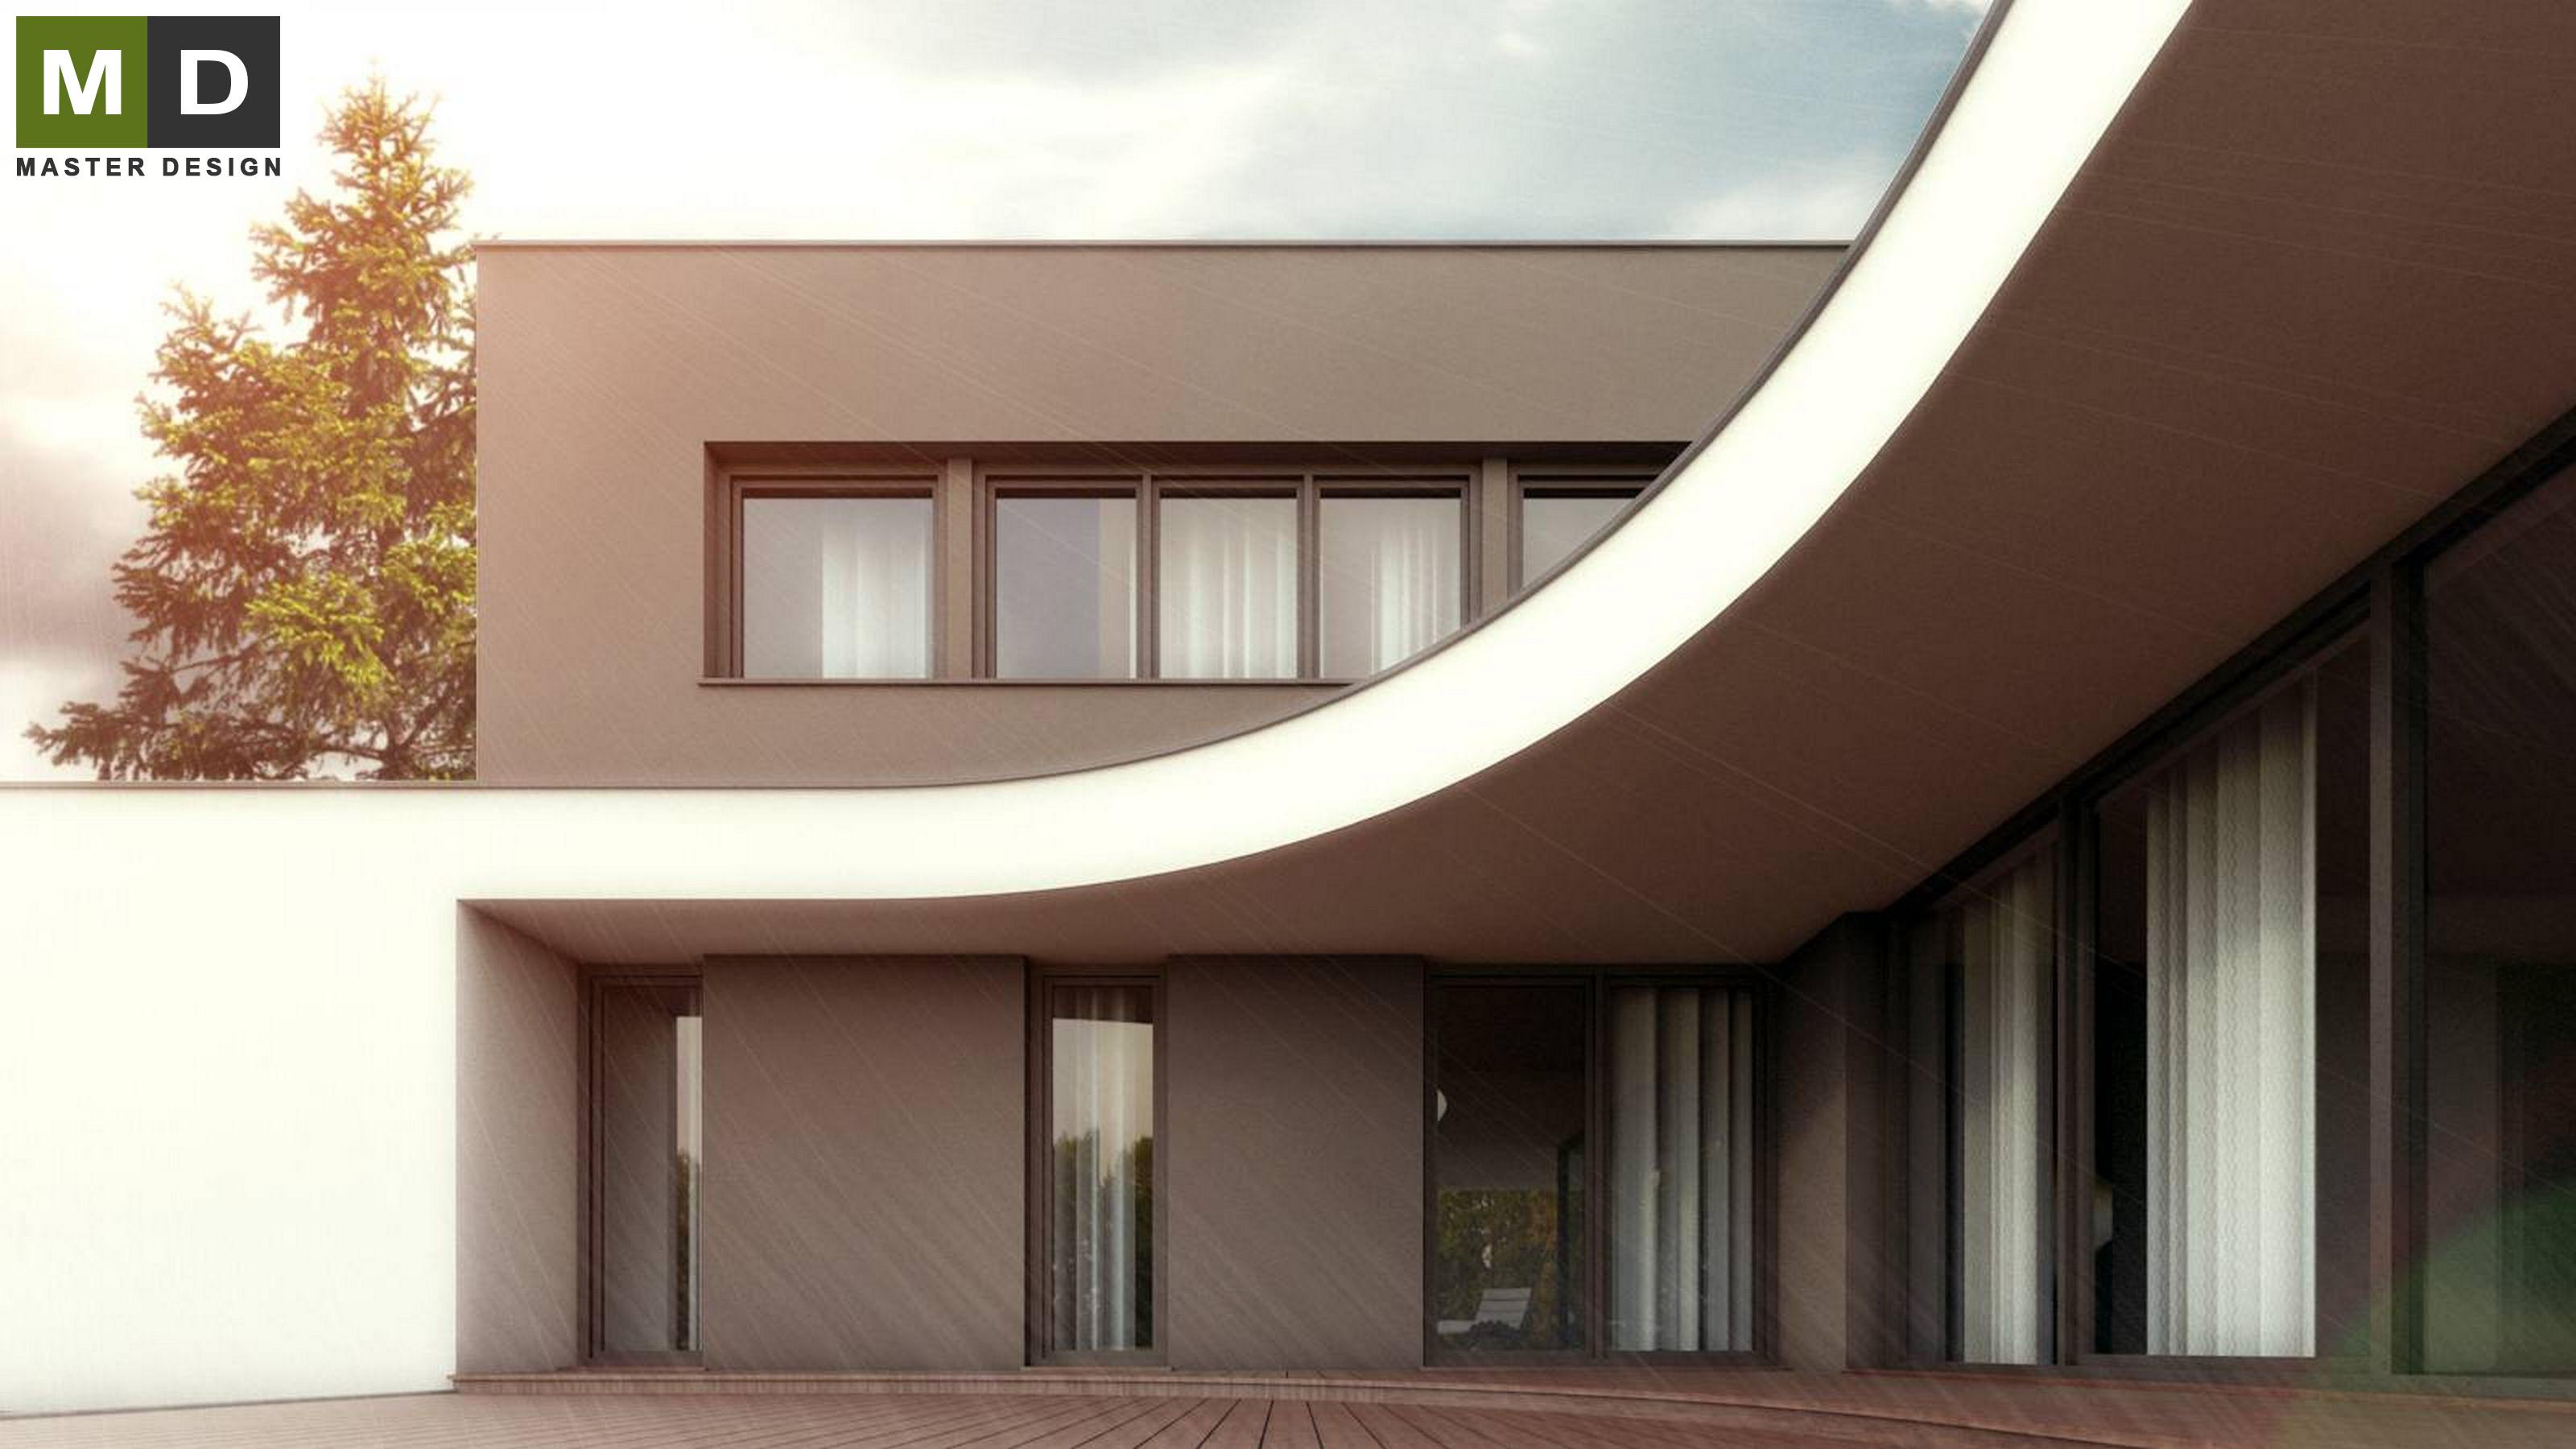 Wonderful Home Design Zlín Part - 11: ... Luxury Low-energy L-shaped House With A Green Roof - Zlín - Vizualizace  ...